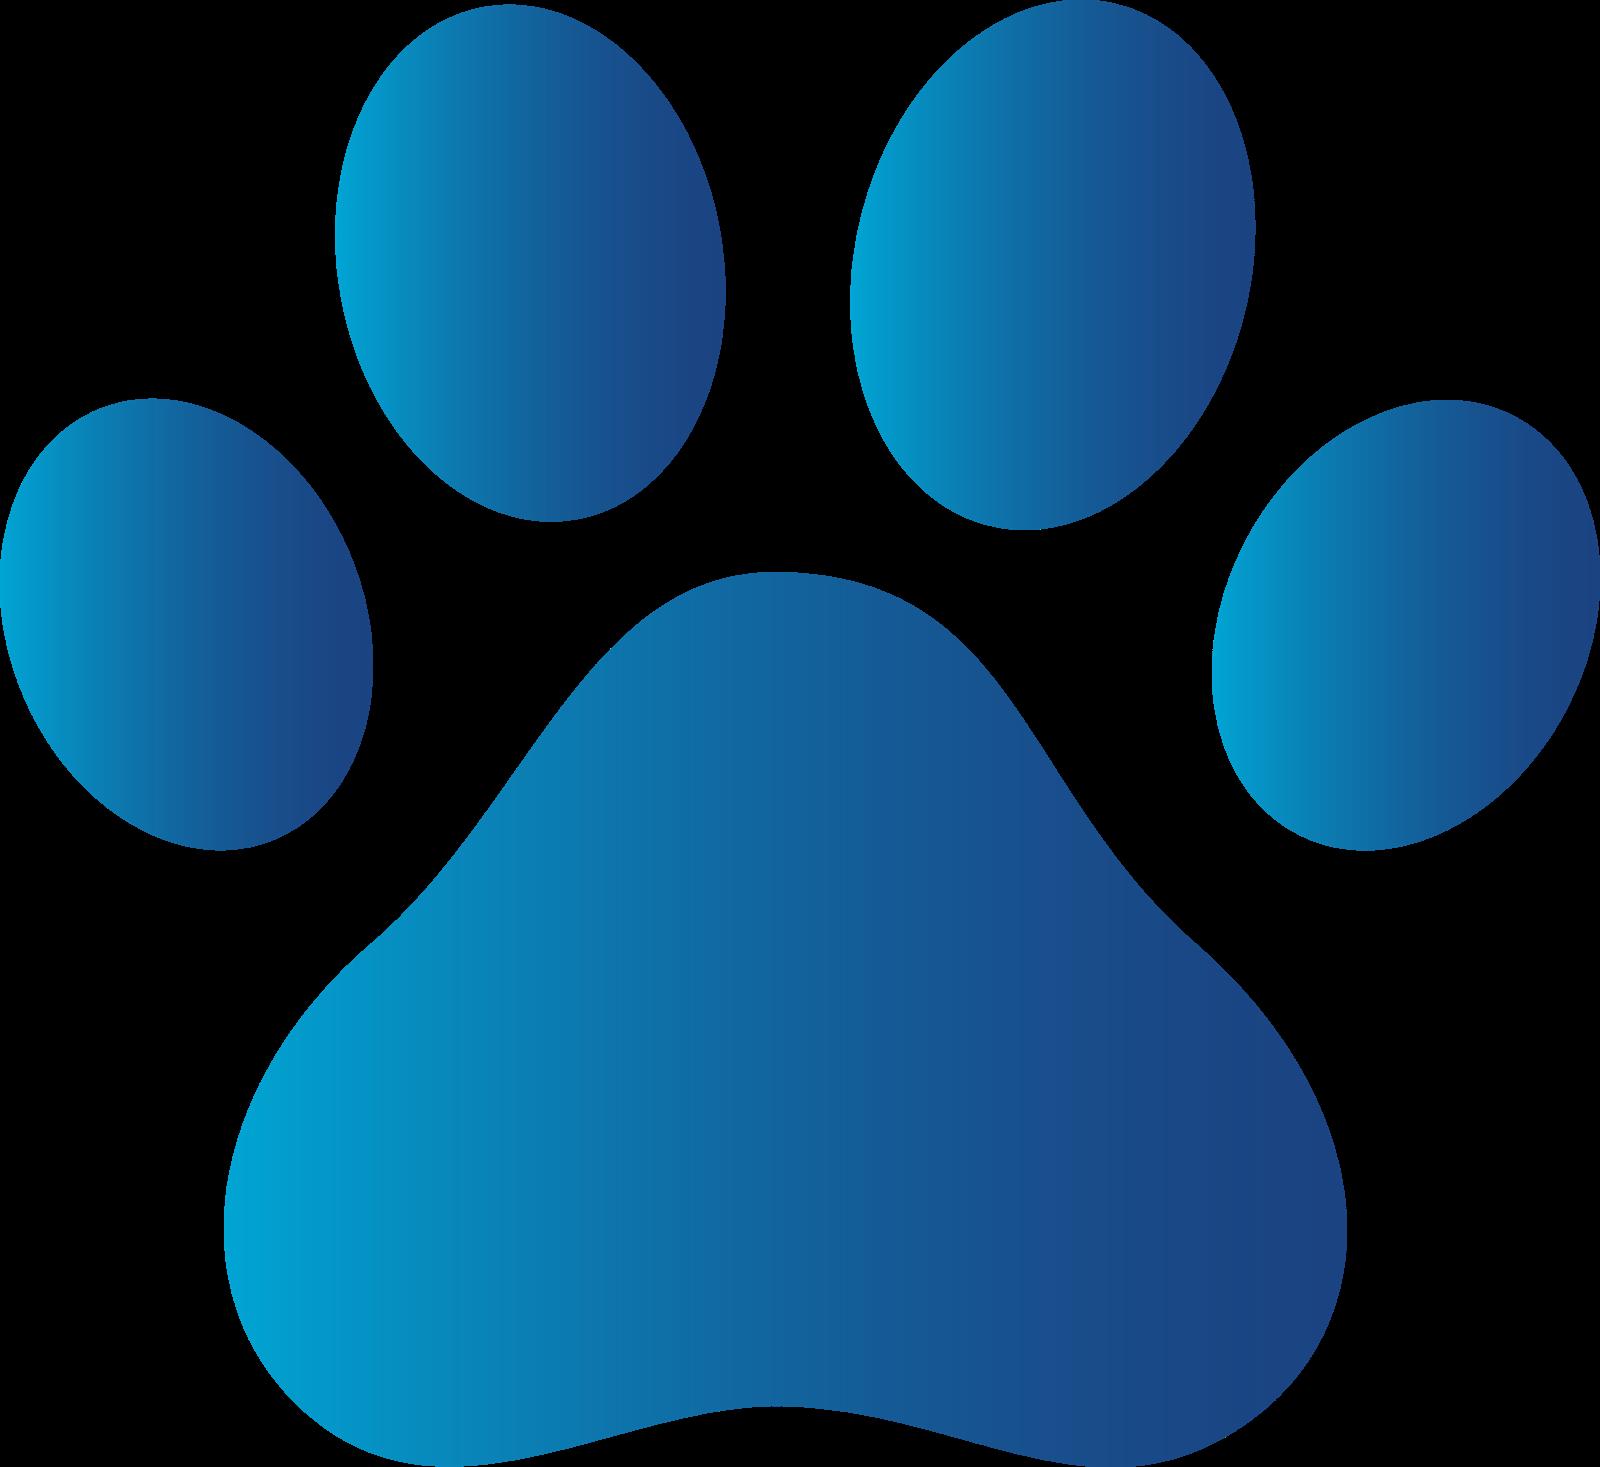 Blue paw Logos